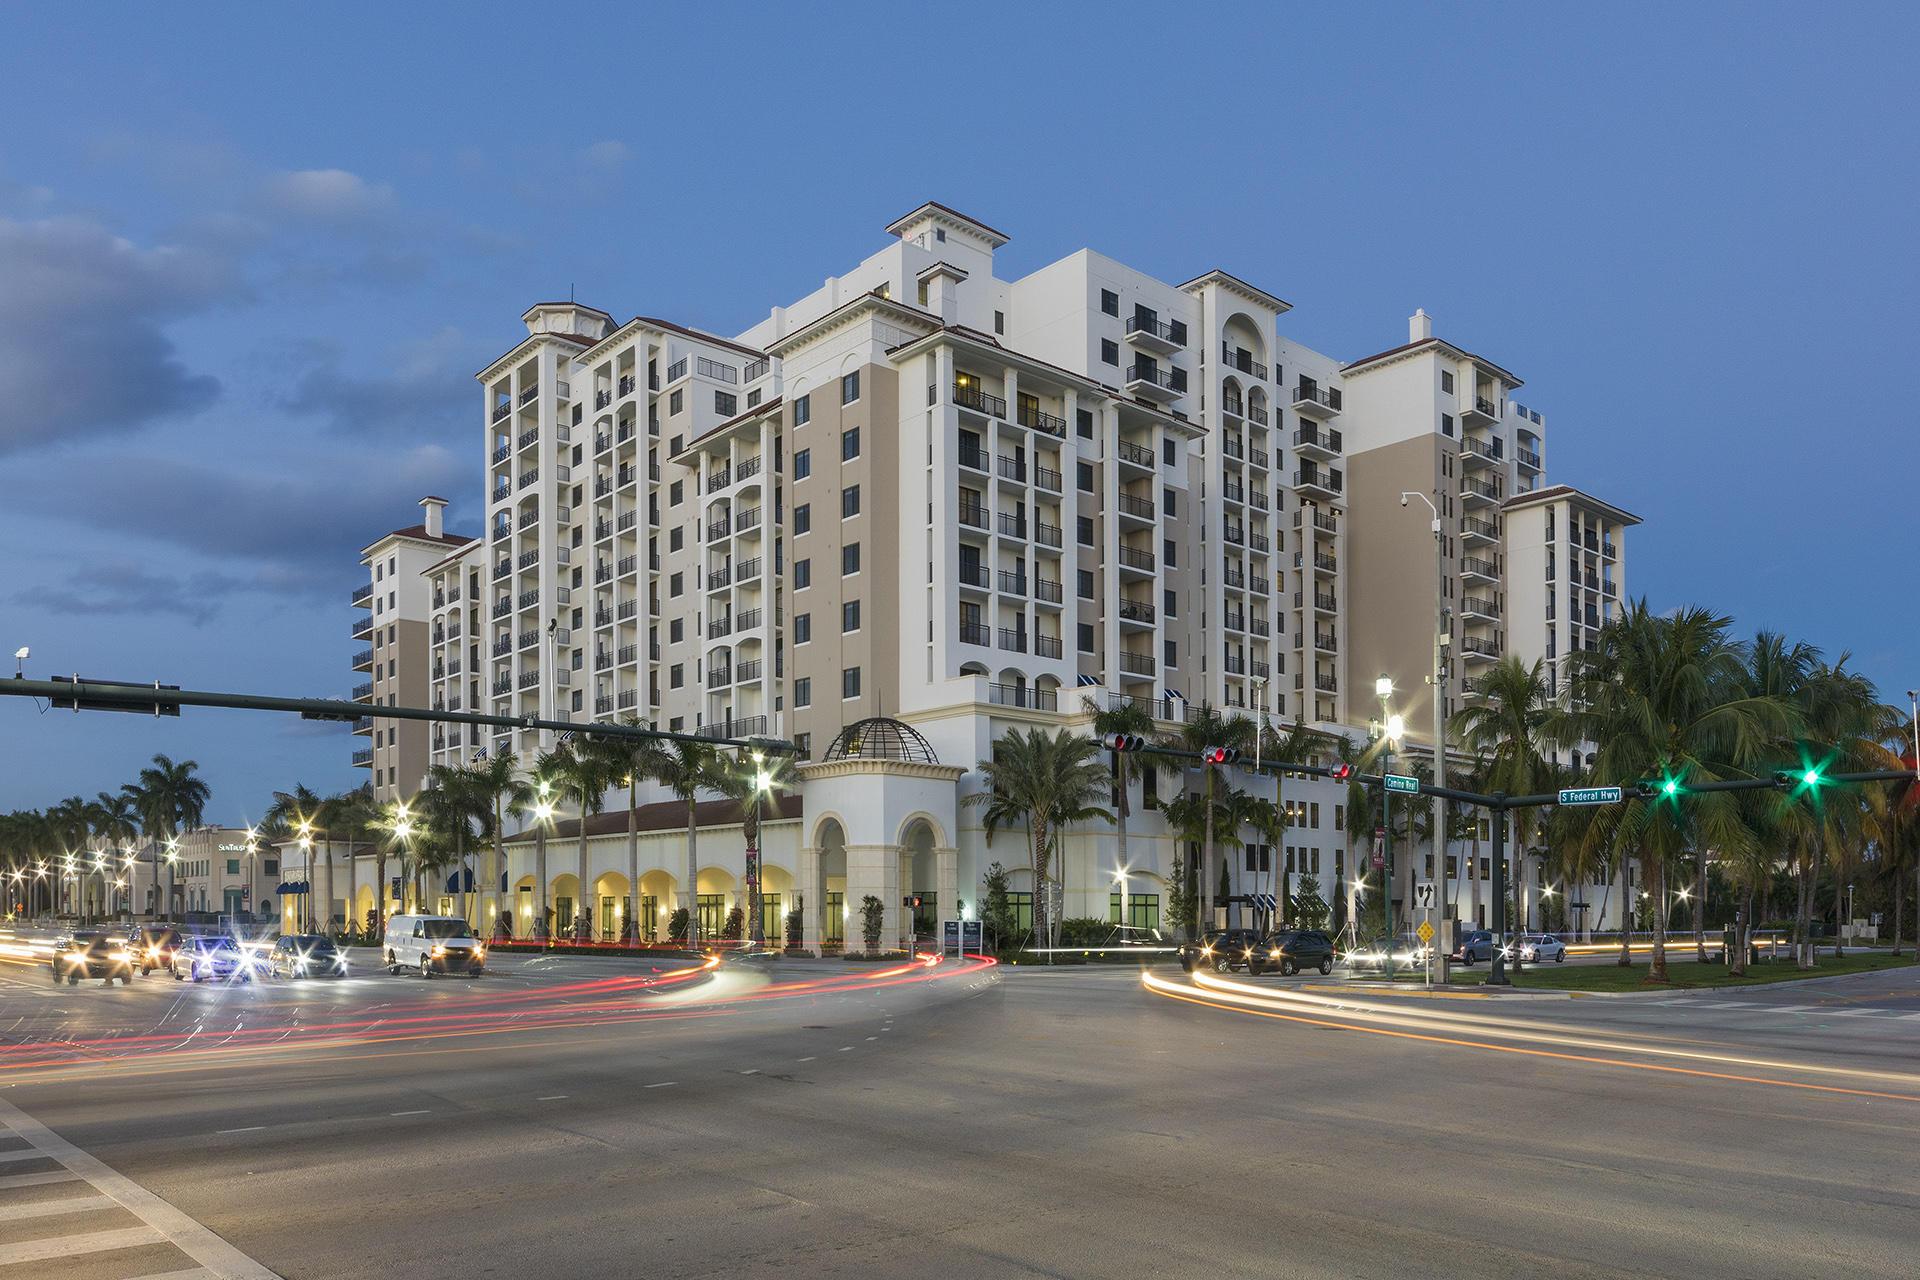 101 Camino Real 836, Boca Raton, Florida 33432, 3 Bedrooms Bedrooms, ,2.1 BathroomsBathrooms,F,Apartment,Camino Real,RX-10617137